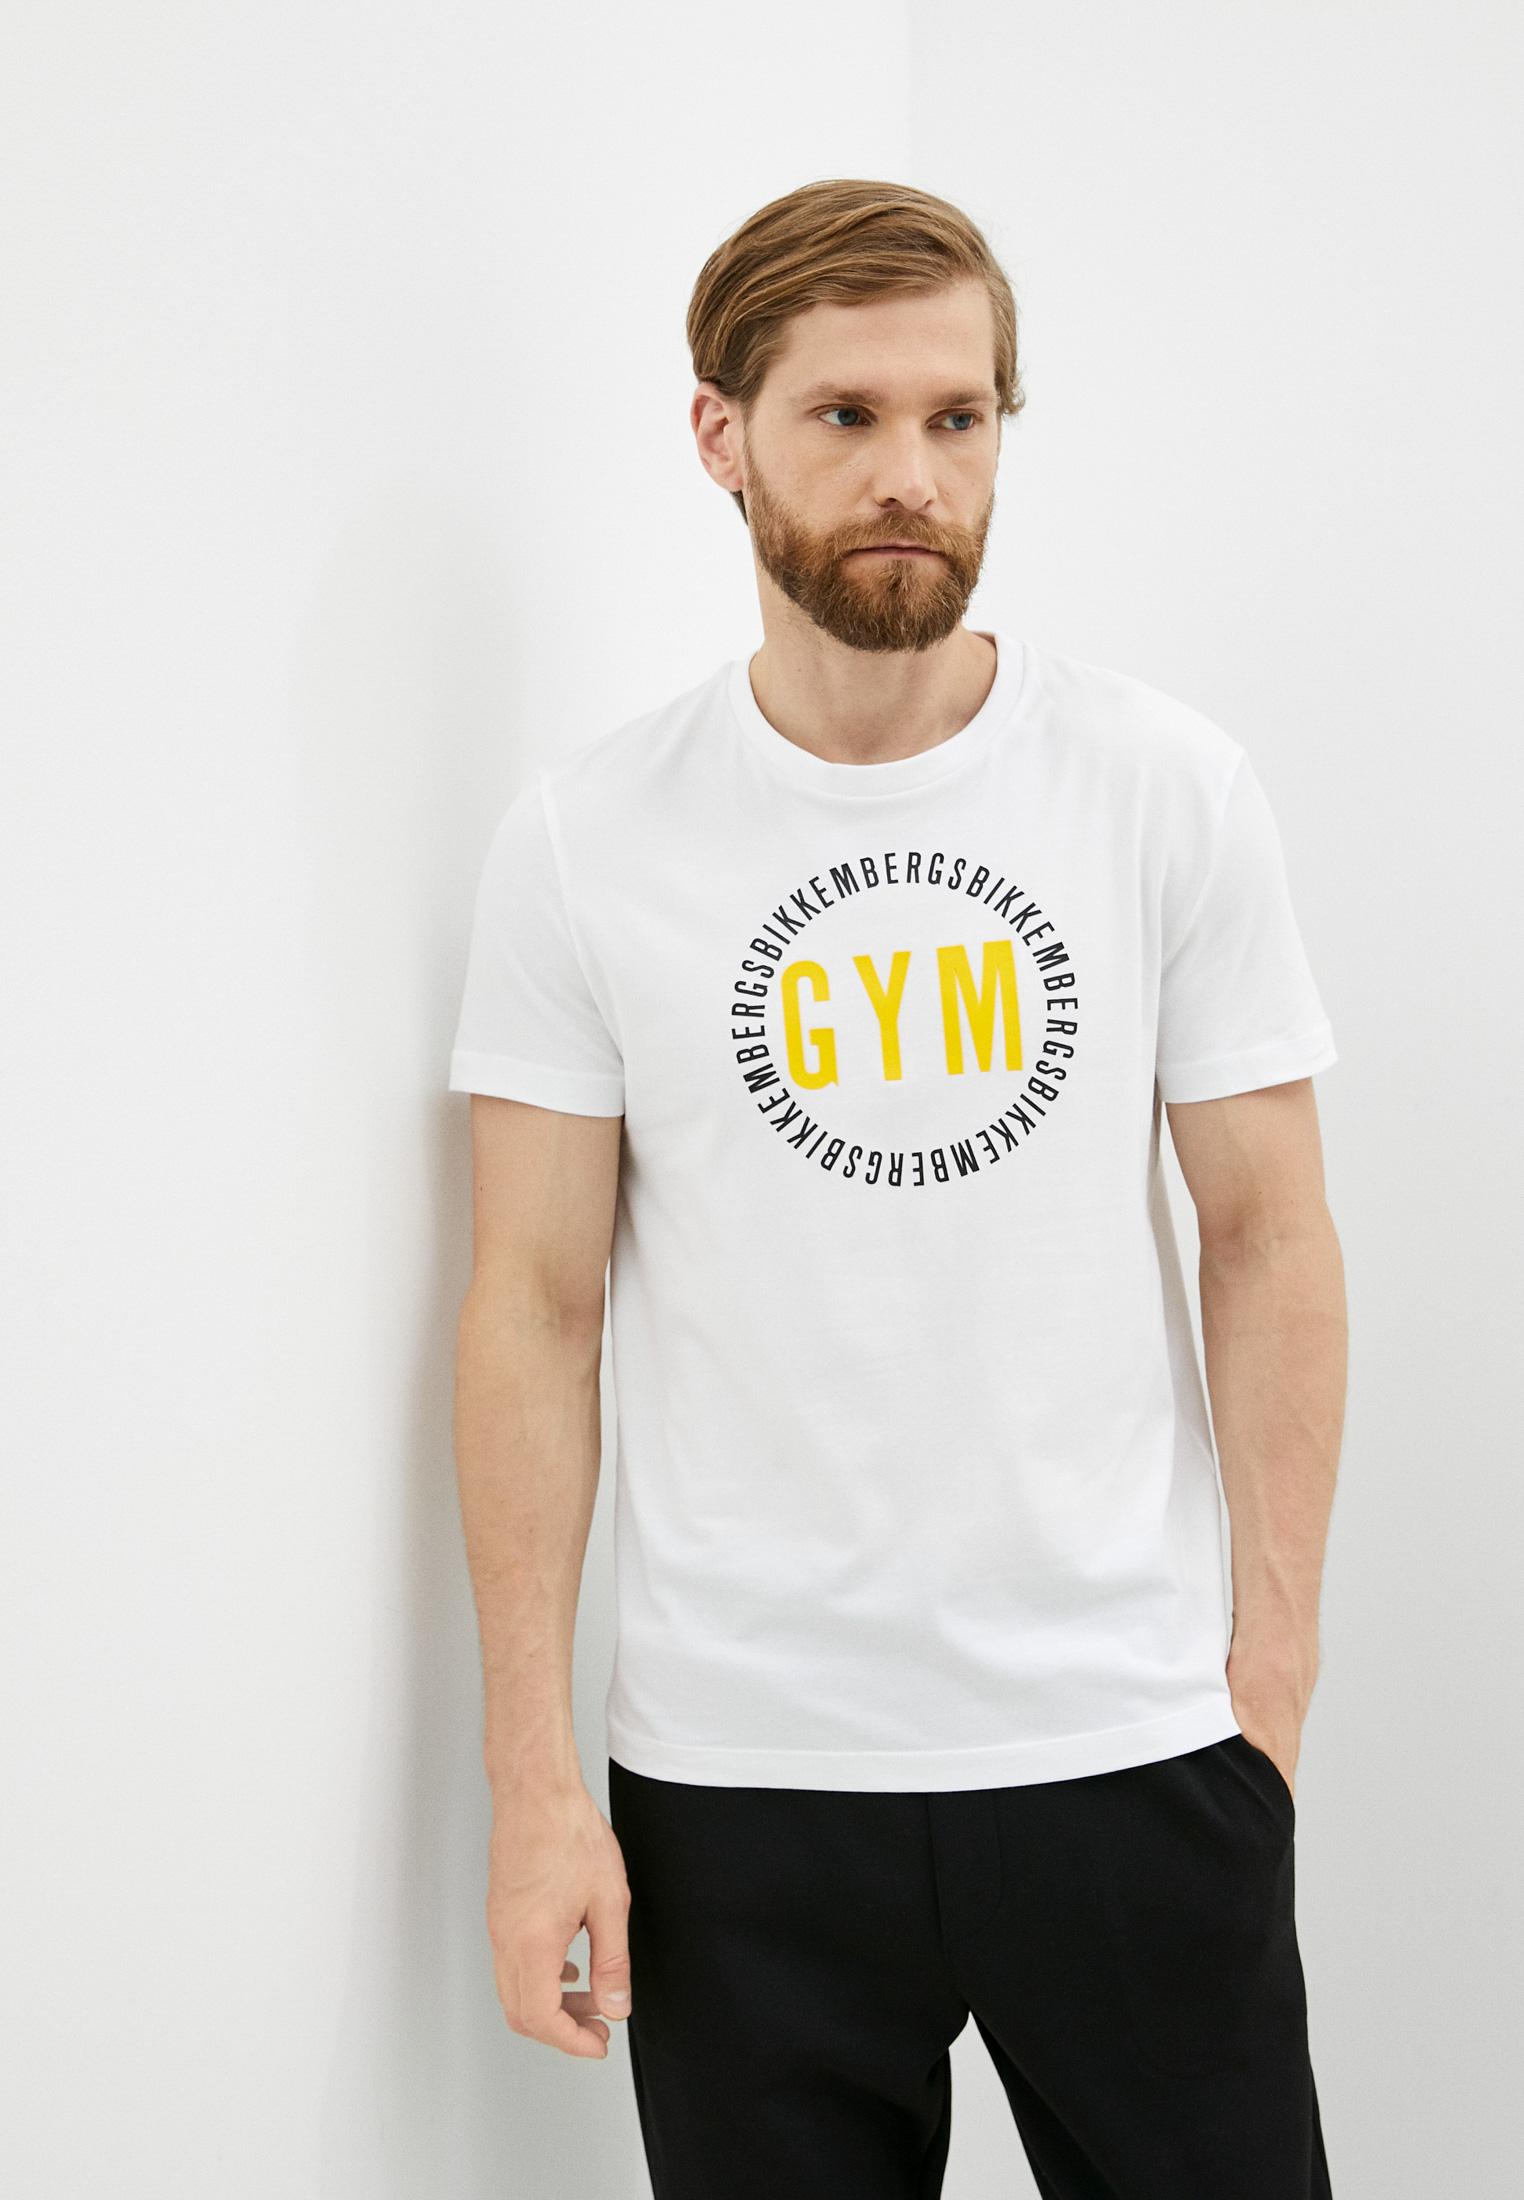 Мужская футболка Bikkembergs (Биккембергс) C 4 101 40 E 2273